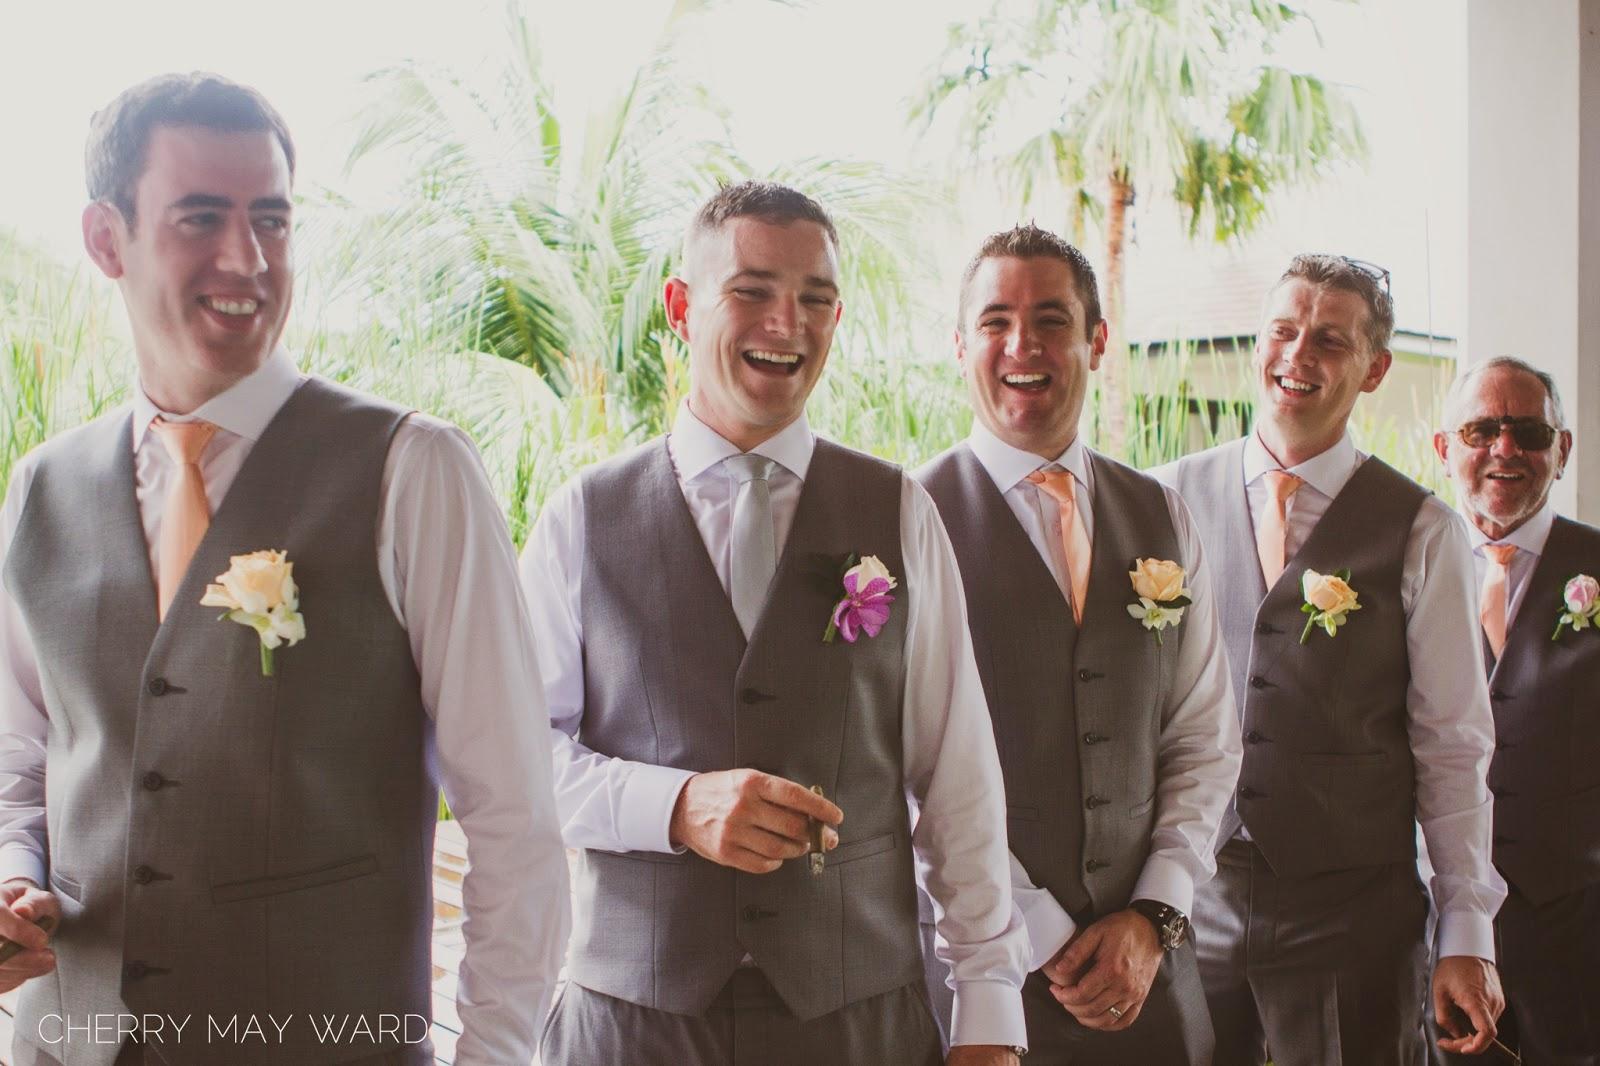 Groom and groomsmen portraits, guys having fun, laughing together, grooms photos, wedding portraits on Koh Samui,